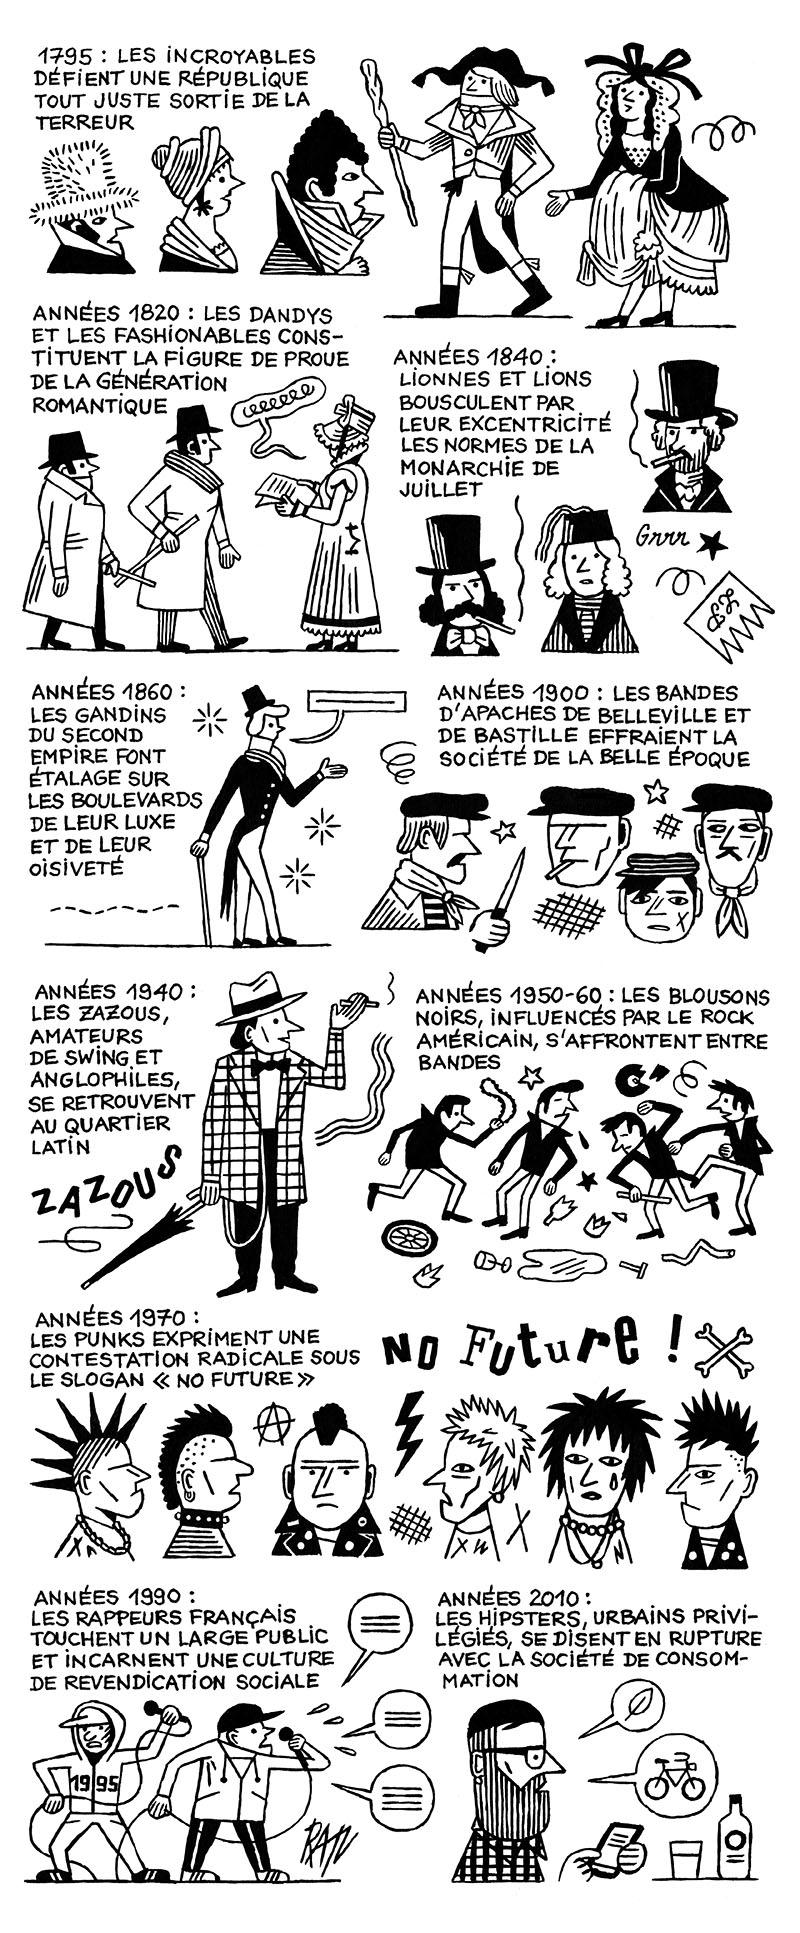 Conception et documentation NICOLAS BOVE